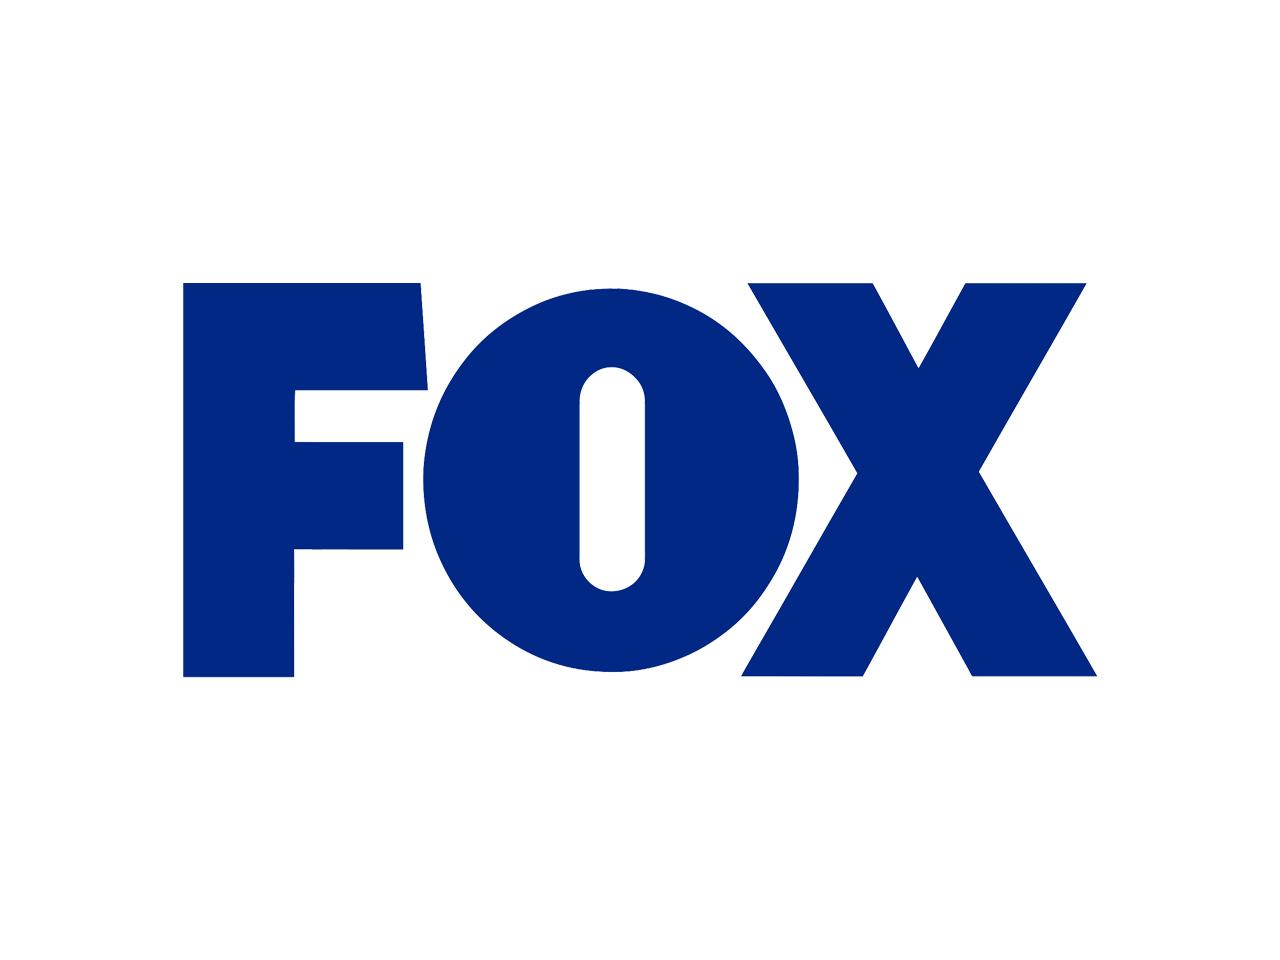 FOX - Network - Logo - 1280 - Featured - 01